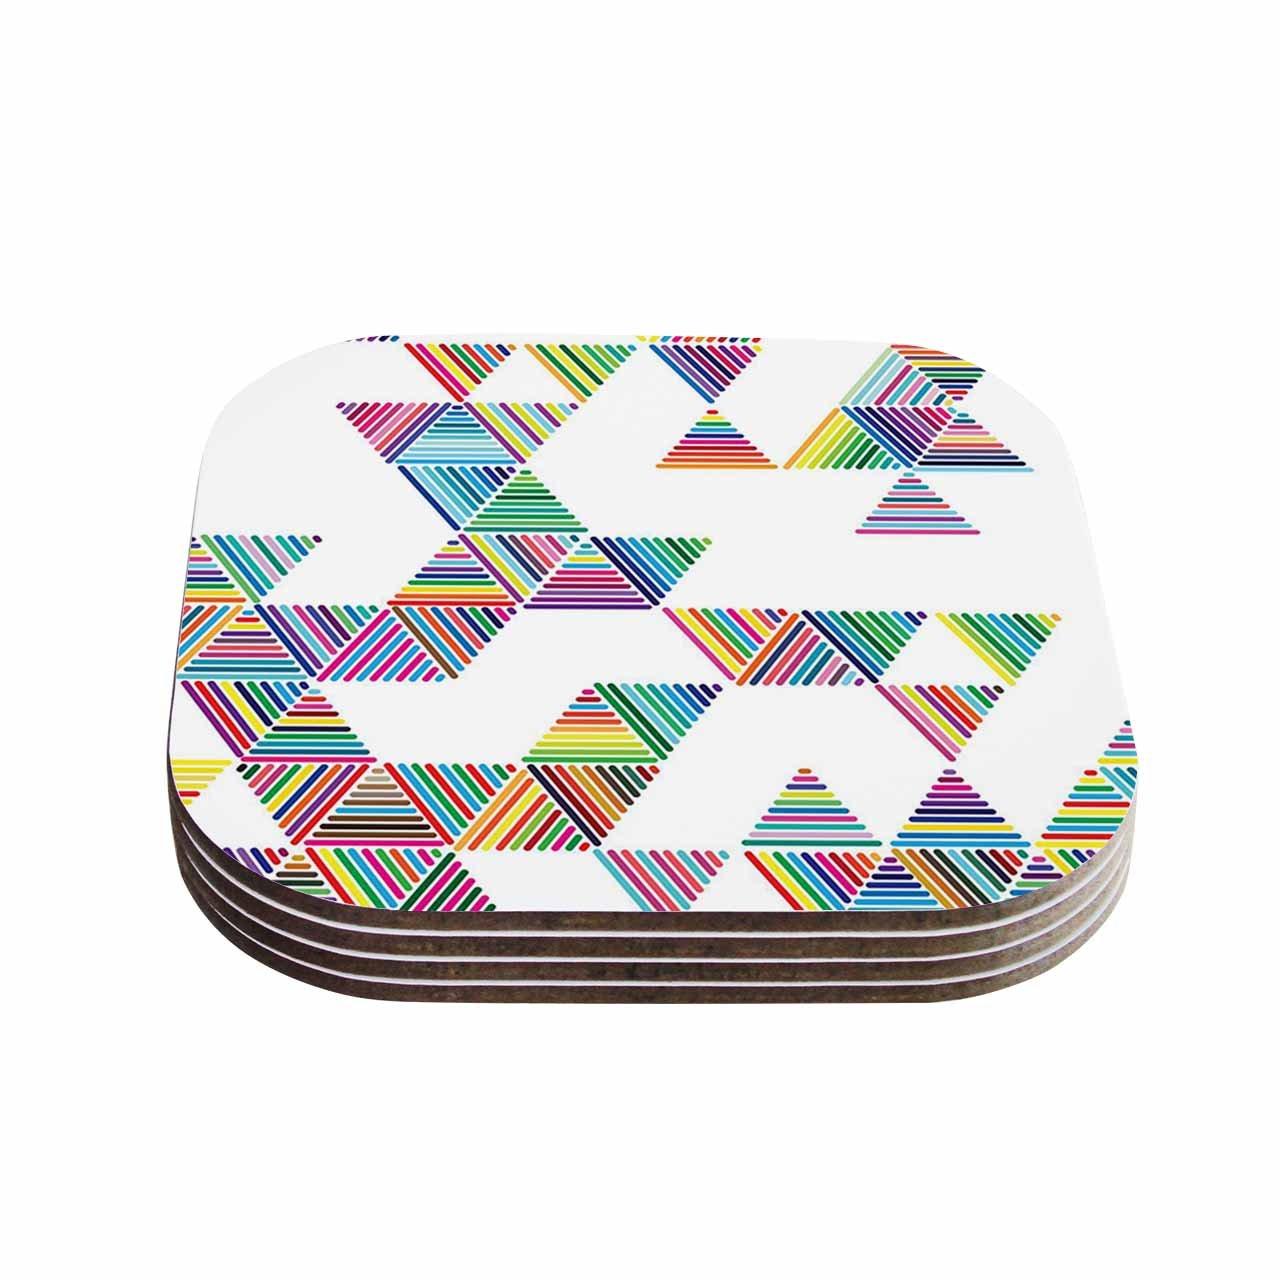 Multicolor Set of 4 KESS InHouse FimbisRainbow Rain White Coasters 4 x 4